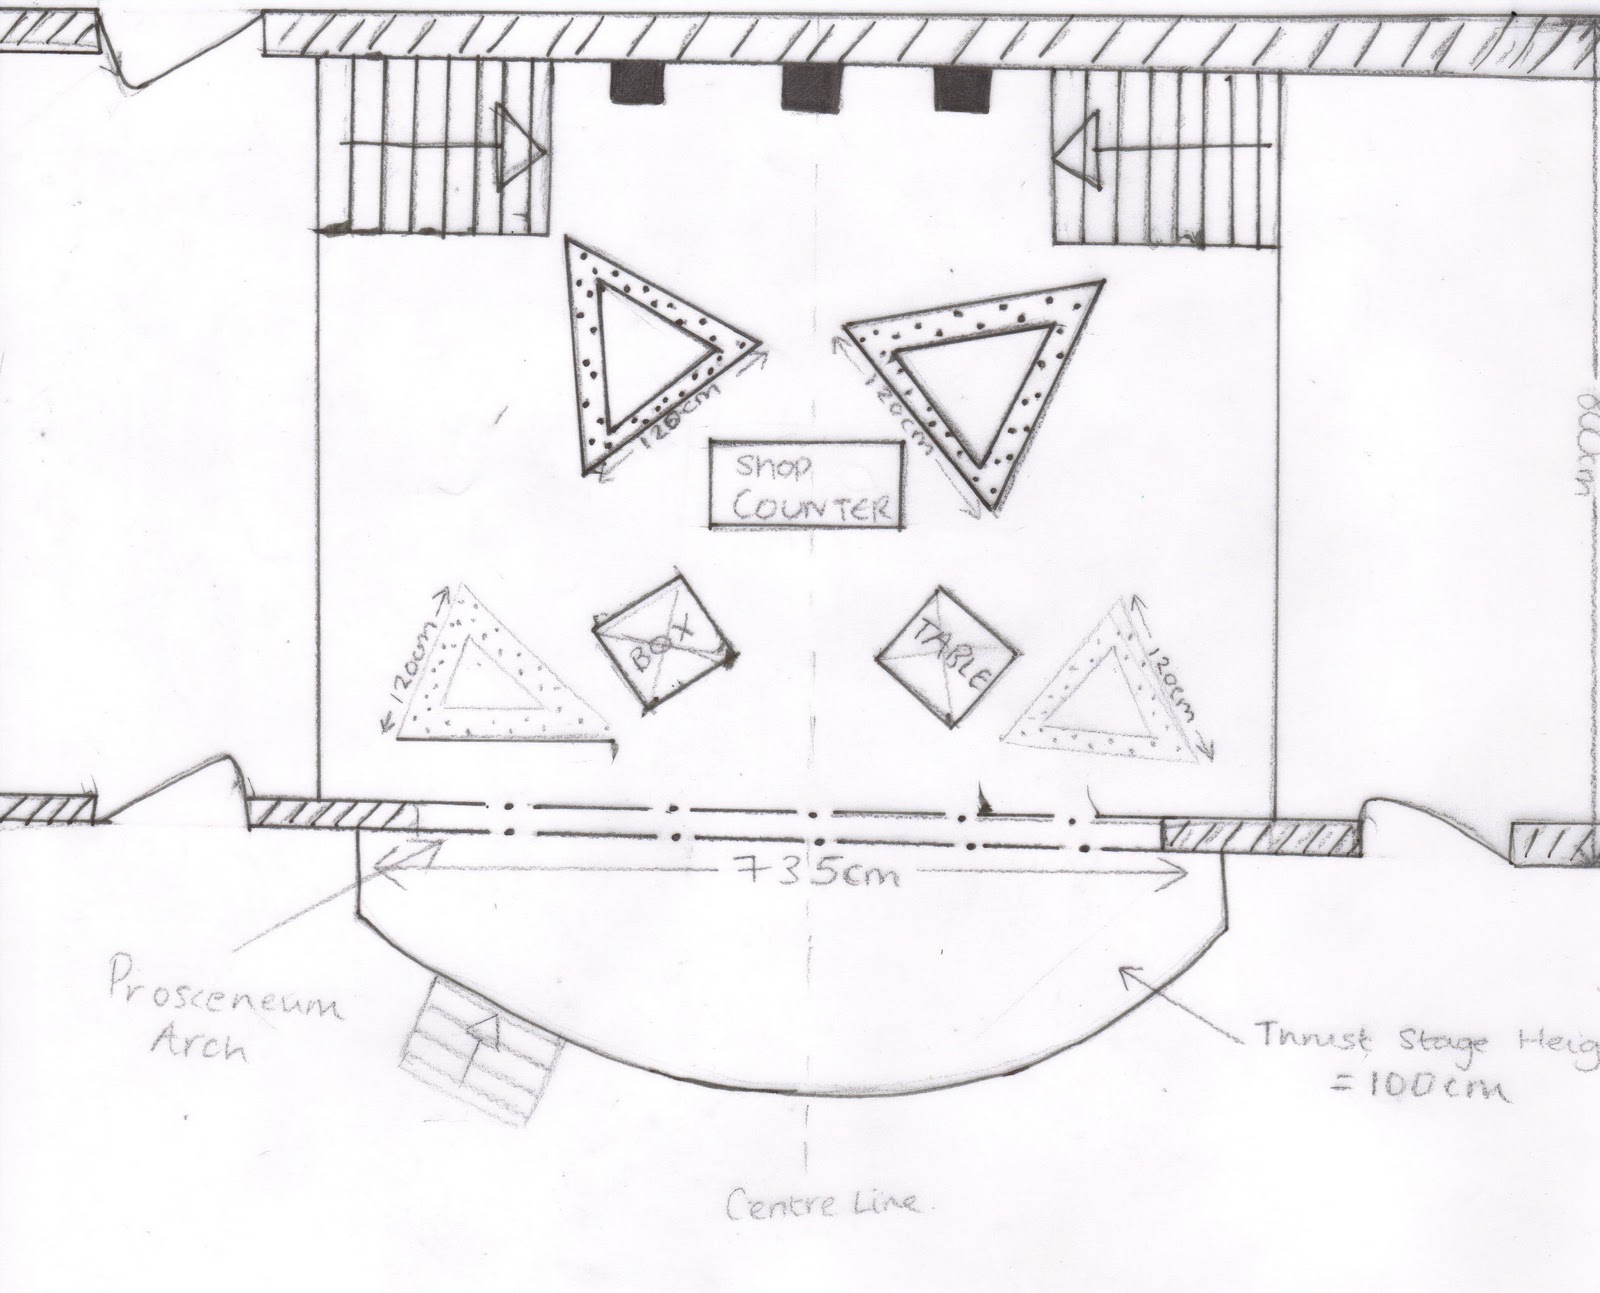 Blank Theatre Stage Diagram Honda Civic 2001 Radio Wiring Design Layout Related Keywords - Long Tail Keywordsking